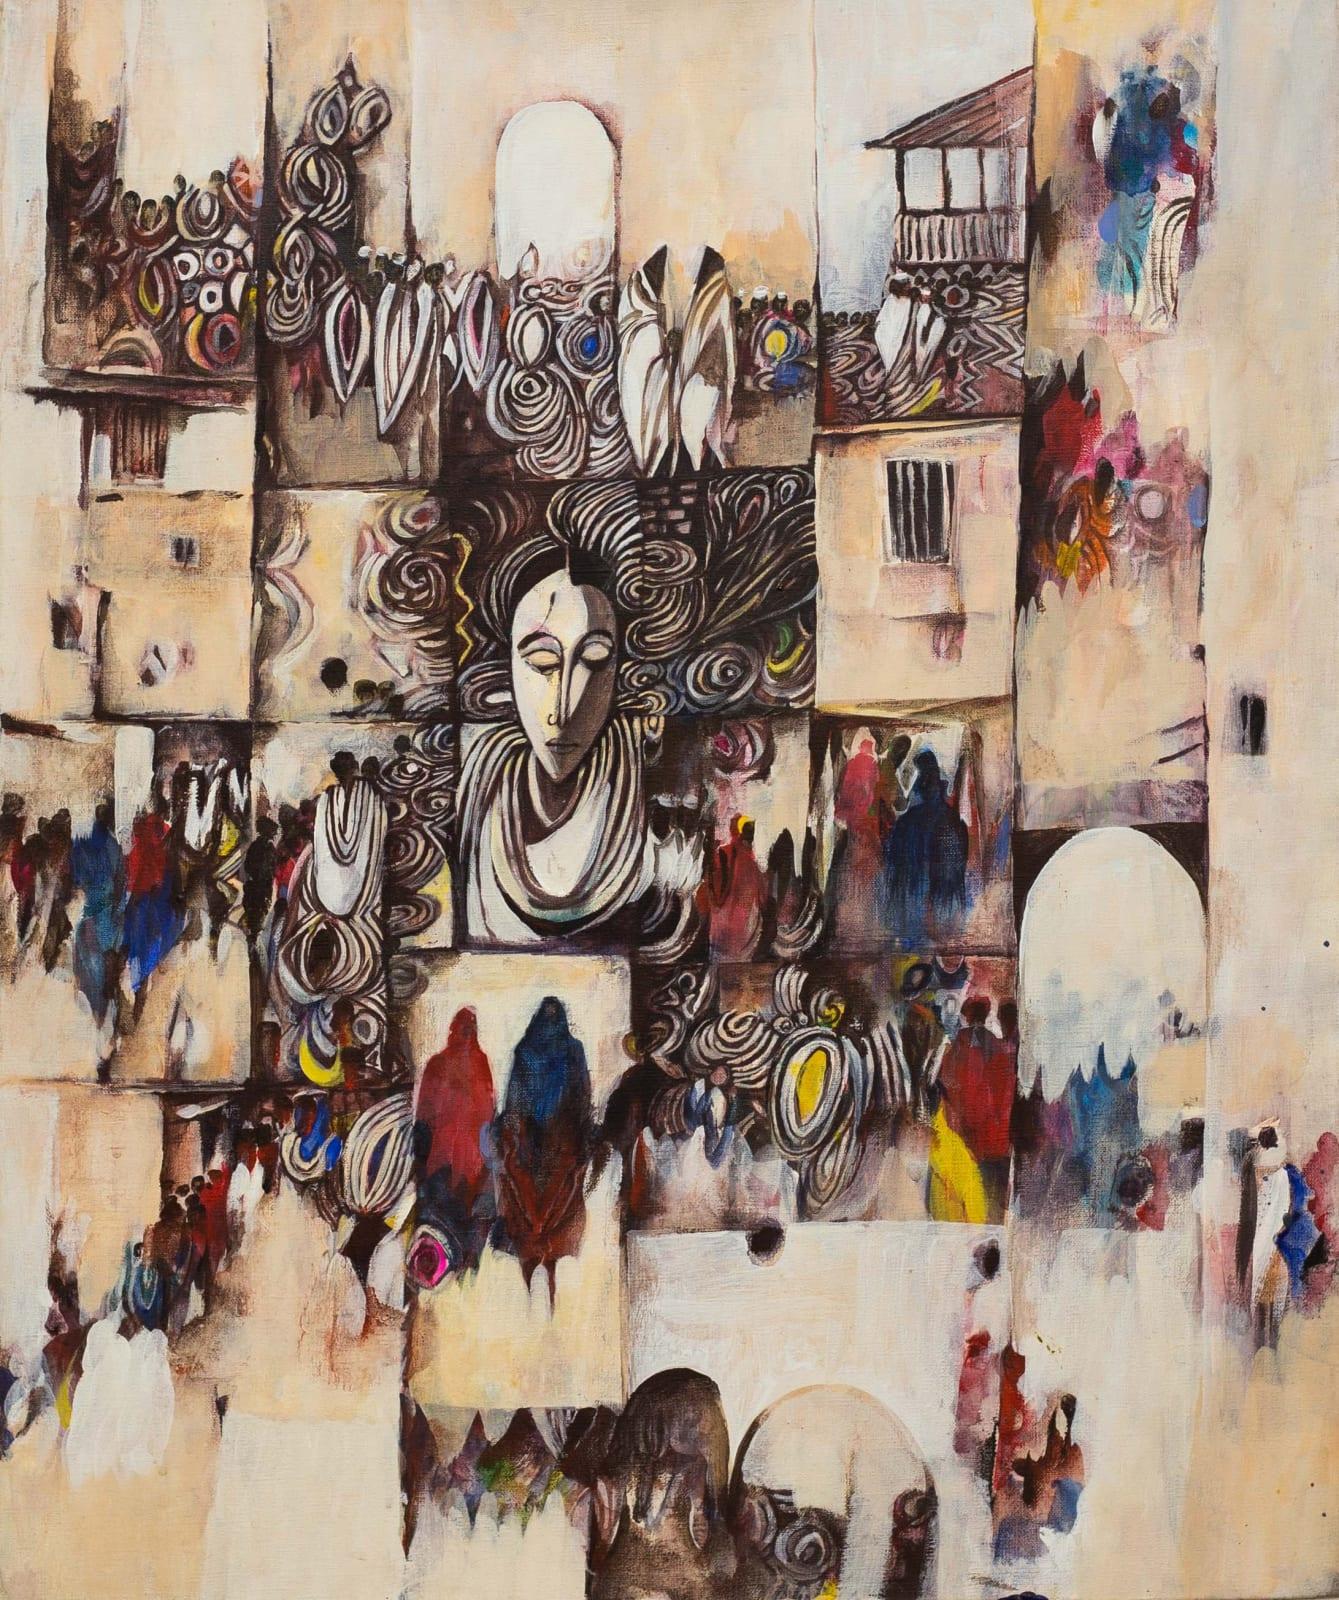 Tibebe Terffa , Impressions II, 2015